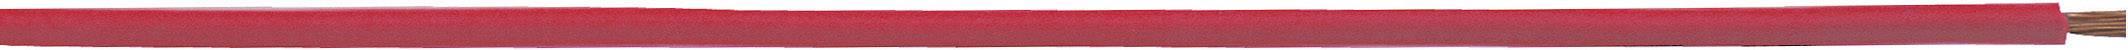 Opletenie / lanko LappKabel 4510023 H05V-K, 1 x 1 mm², vonkajší Ø 2.60 mm, 100 m, modrá